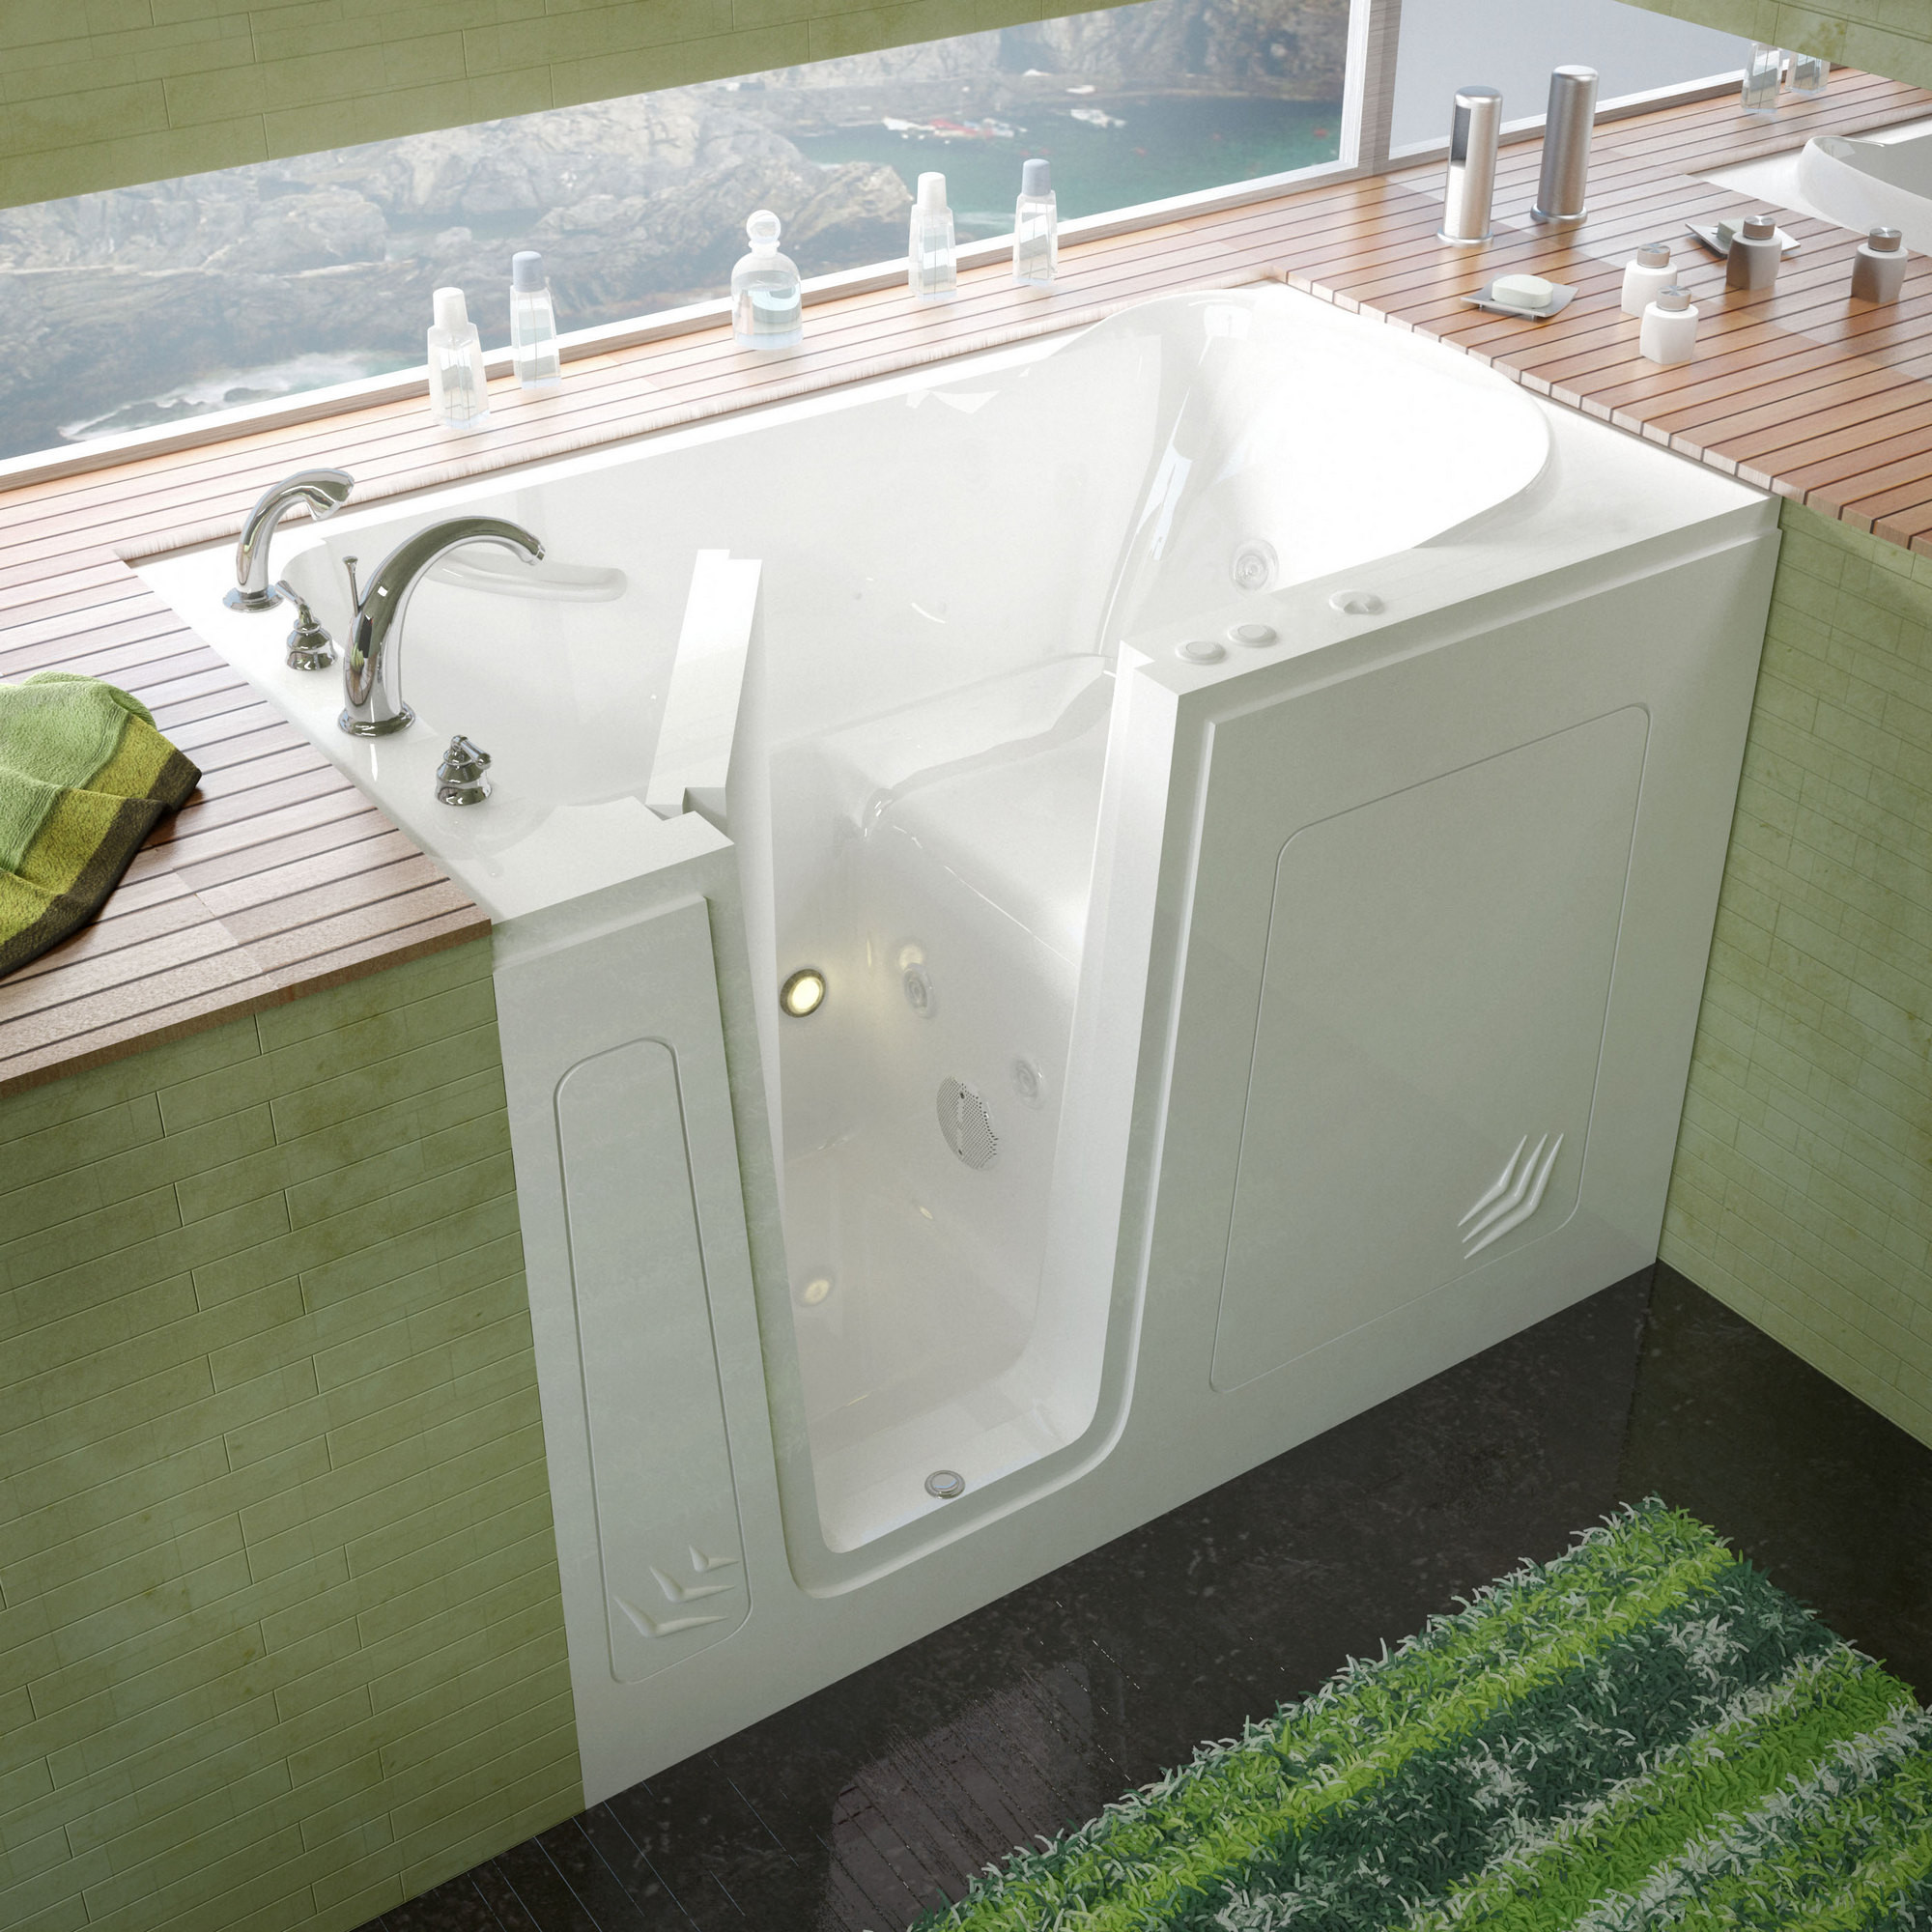 MediTub 3054LWH Walk-In 30 x 54 Left Drain White Whirlpool Jetted Bathtub